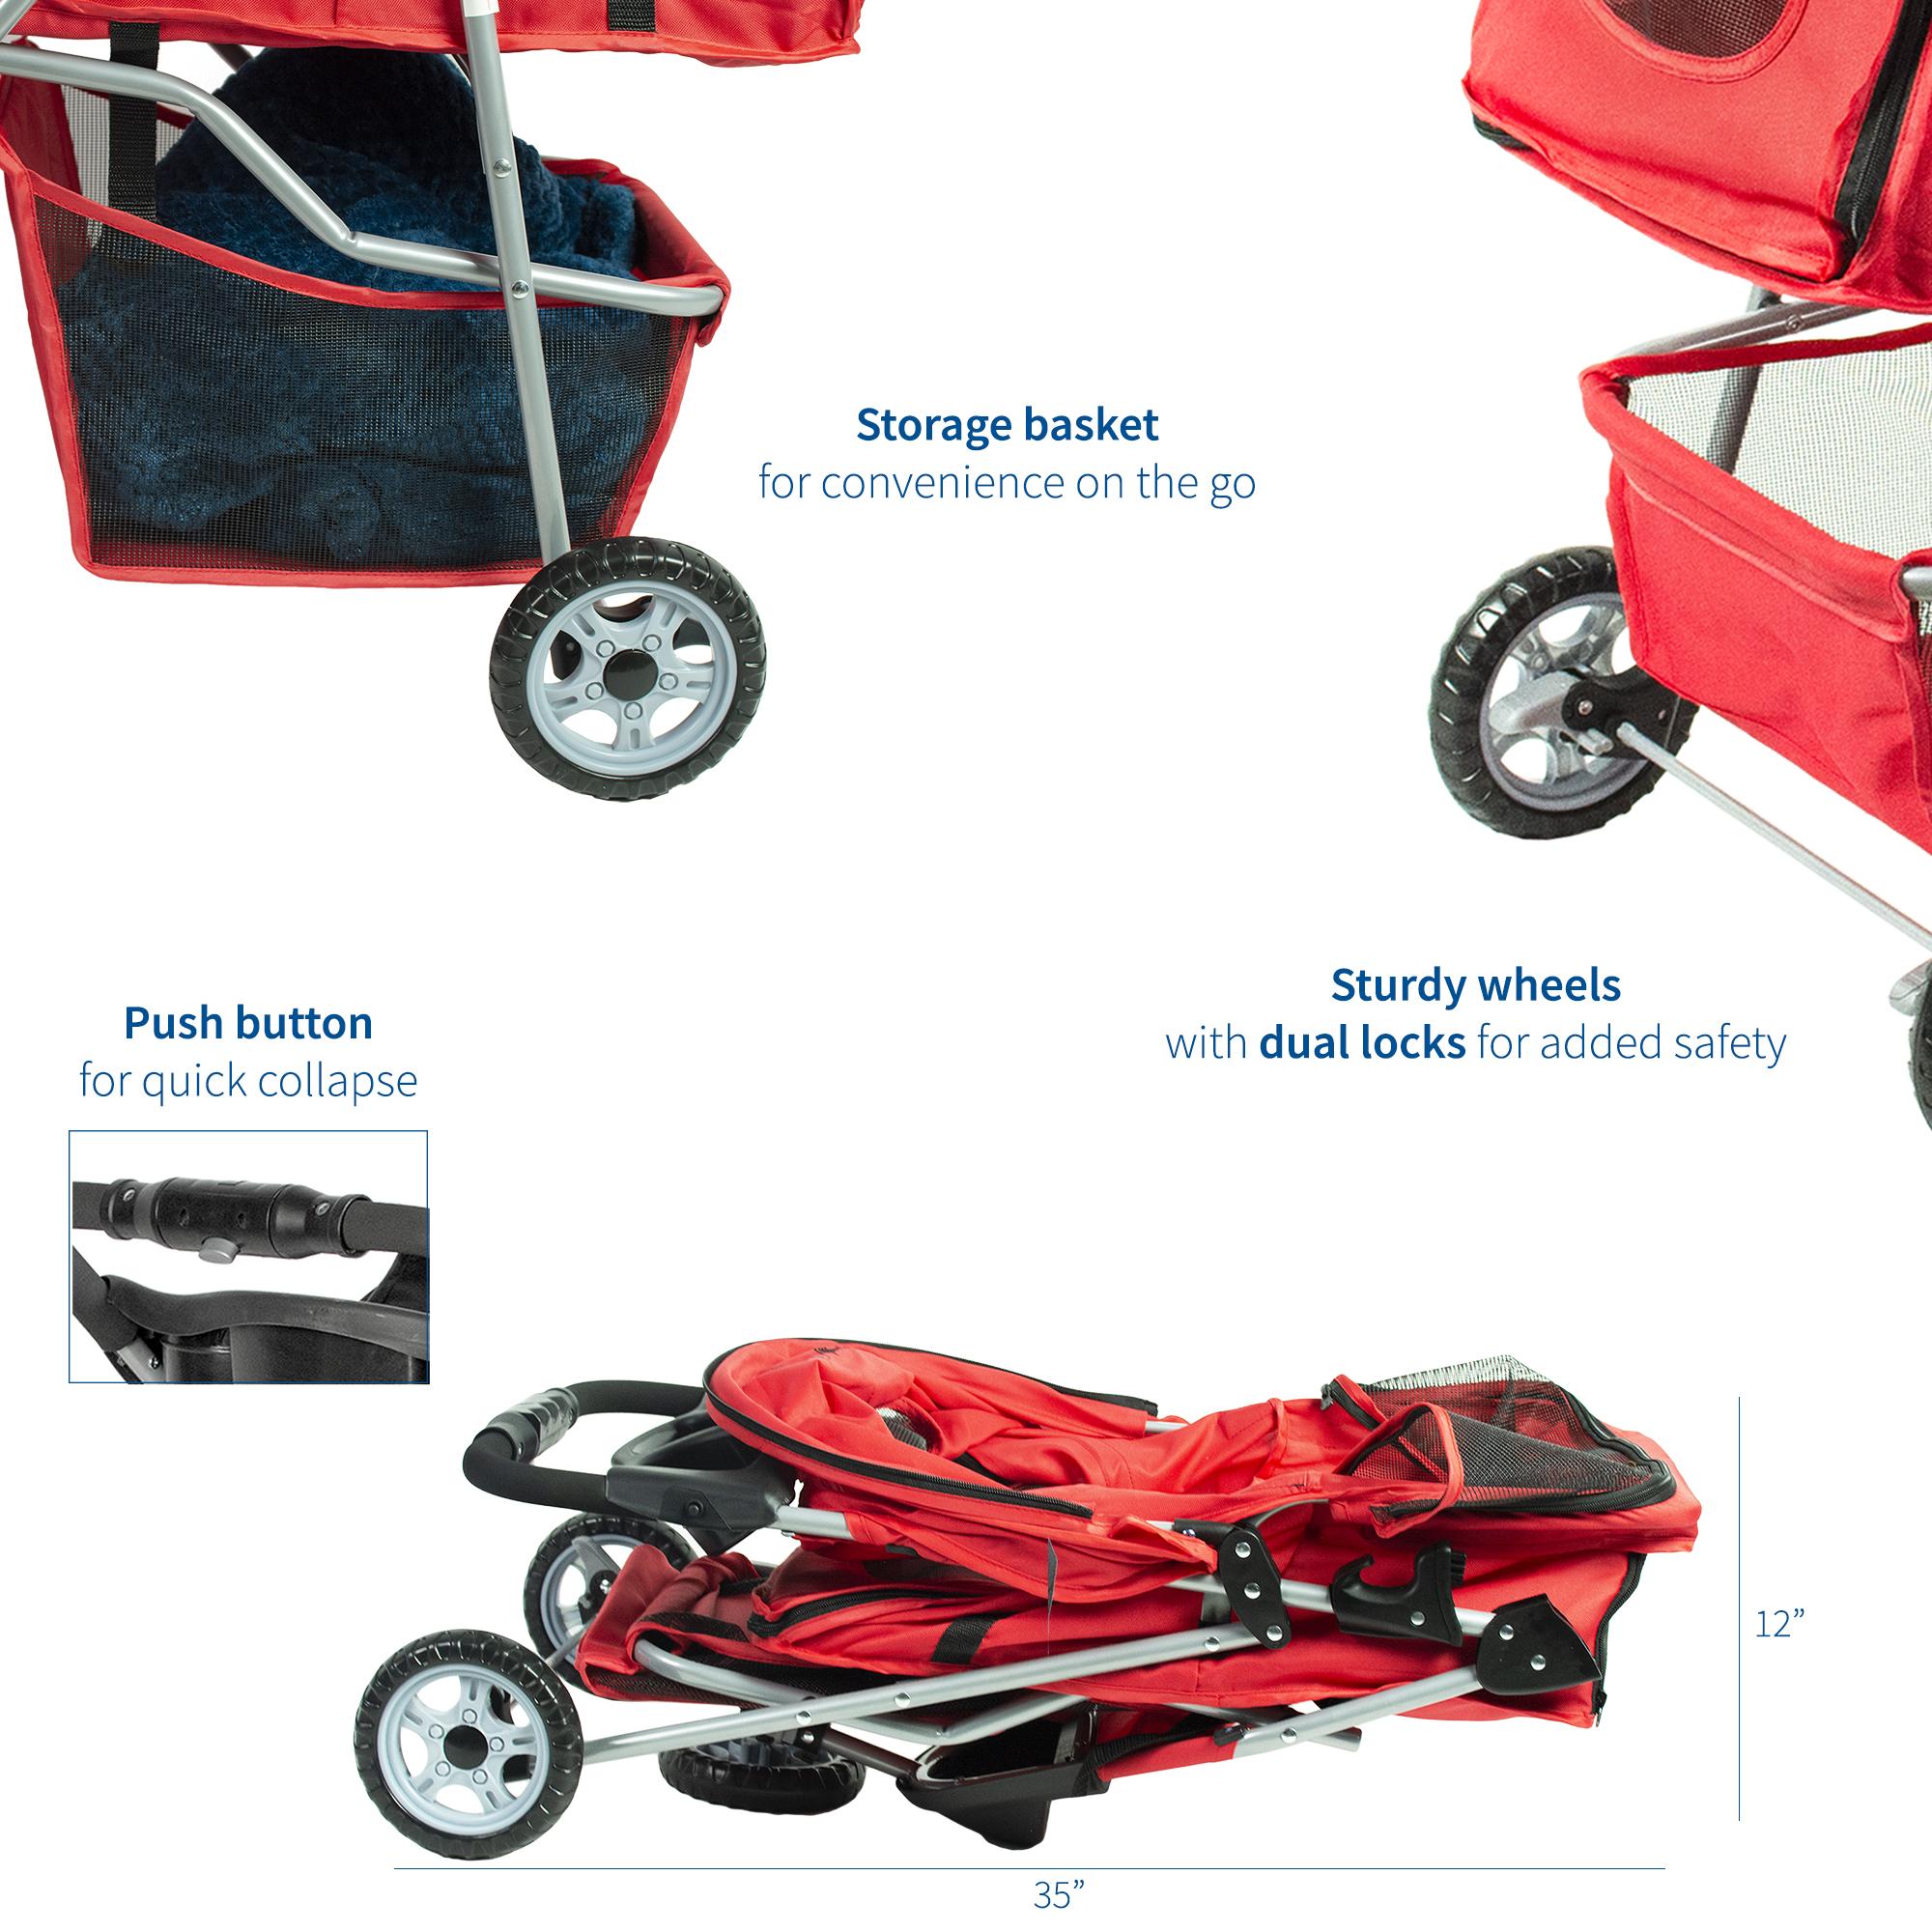 thumbnail 25 - VIVO Three Wheel Pet Stroller / Cat & Dog Foldable Carrier Strolling Cart